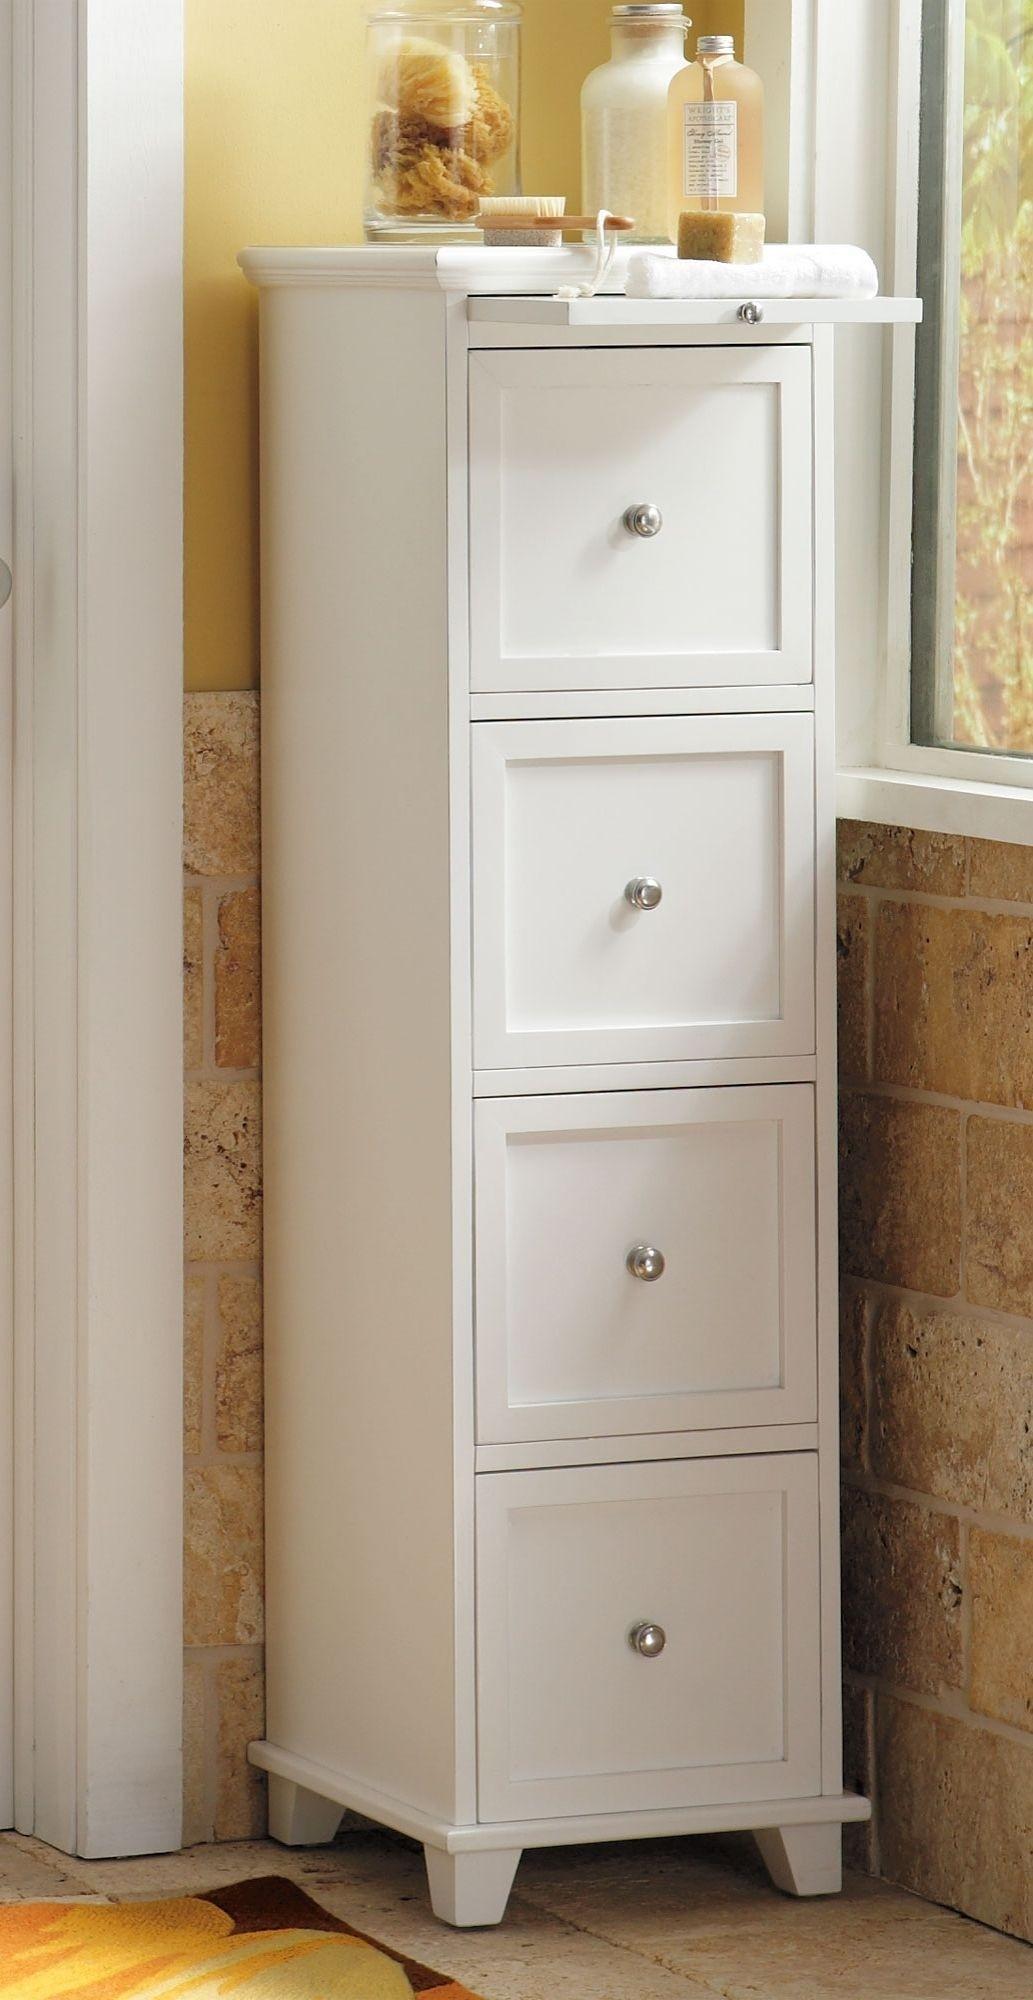 Ordinaire Slim Storage Cabinet